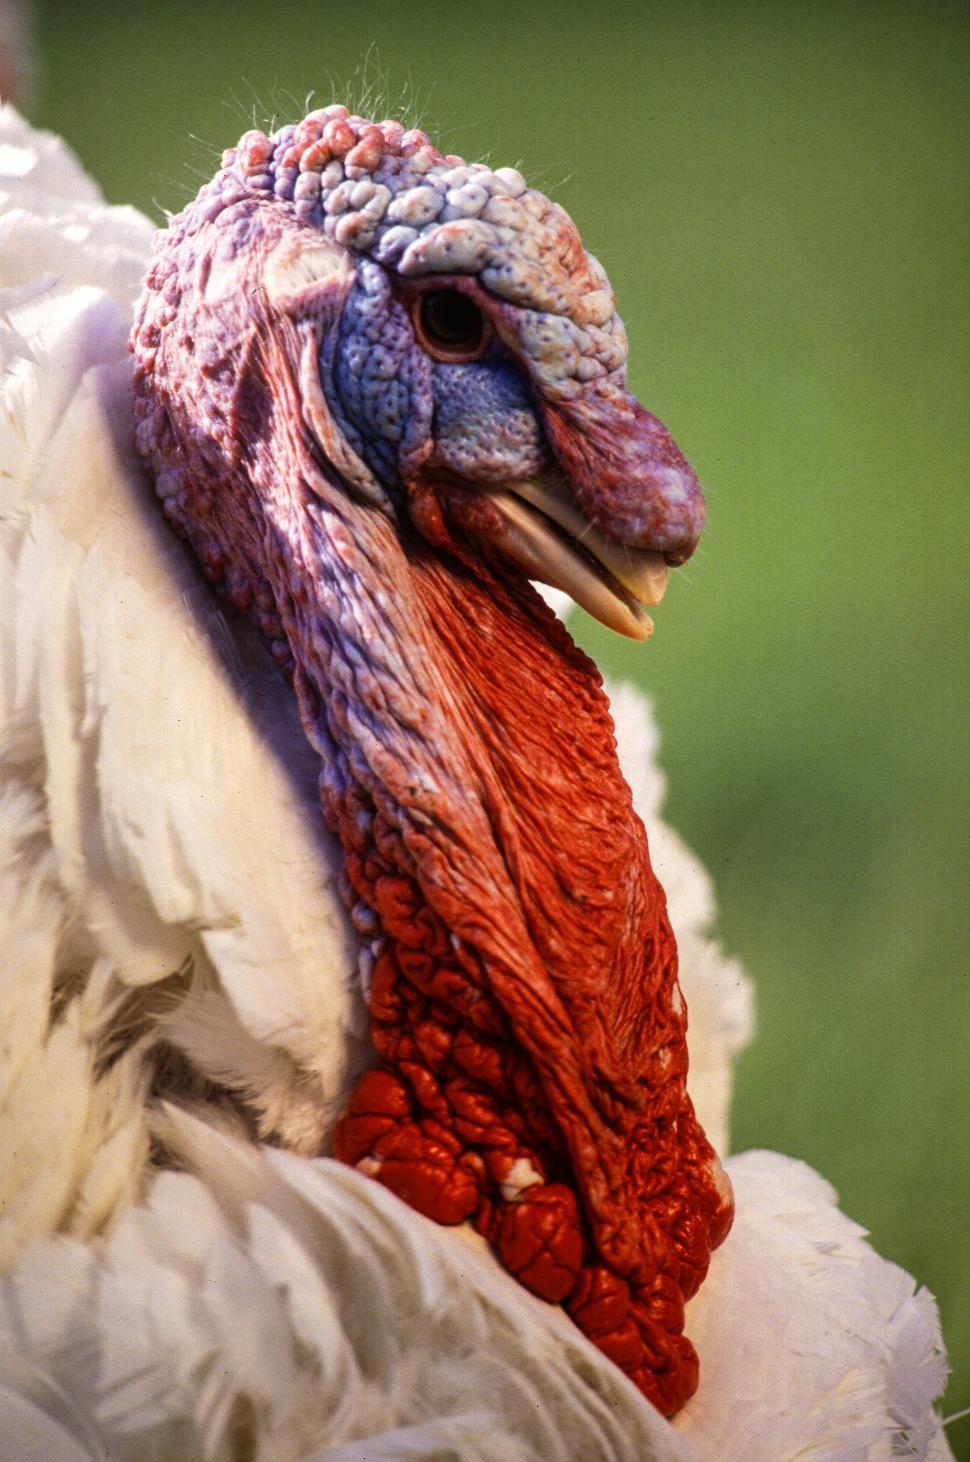 Download Free Stock HD Photo of Midget White Turkey Online